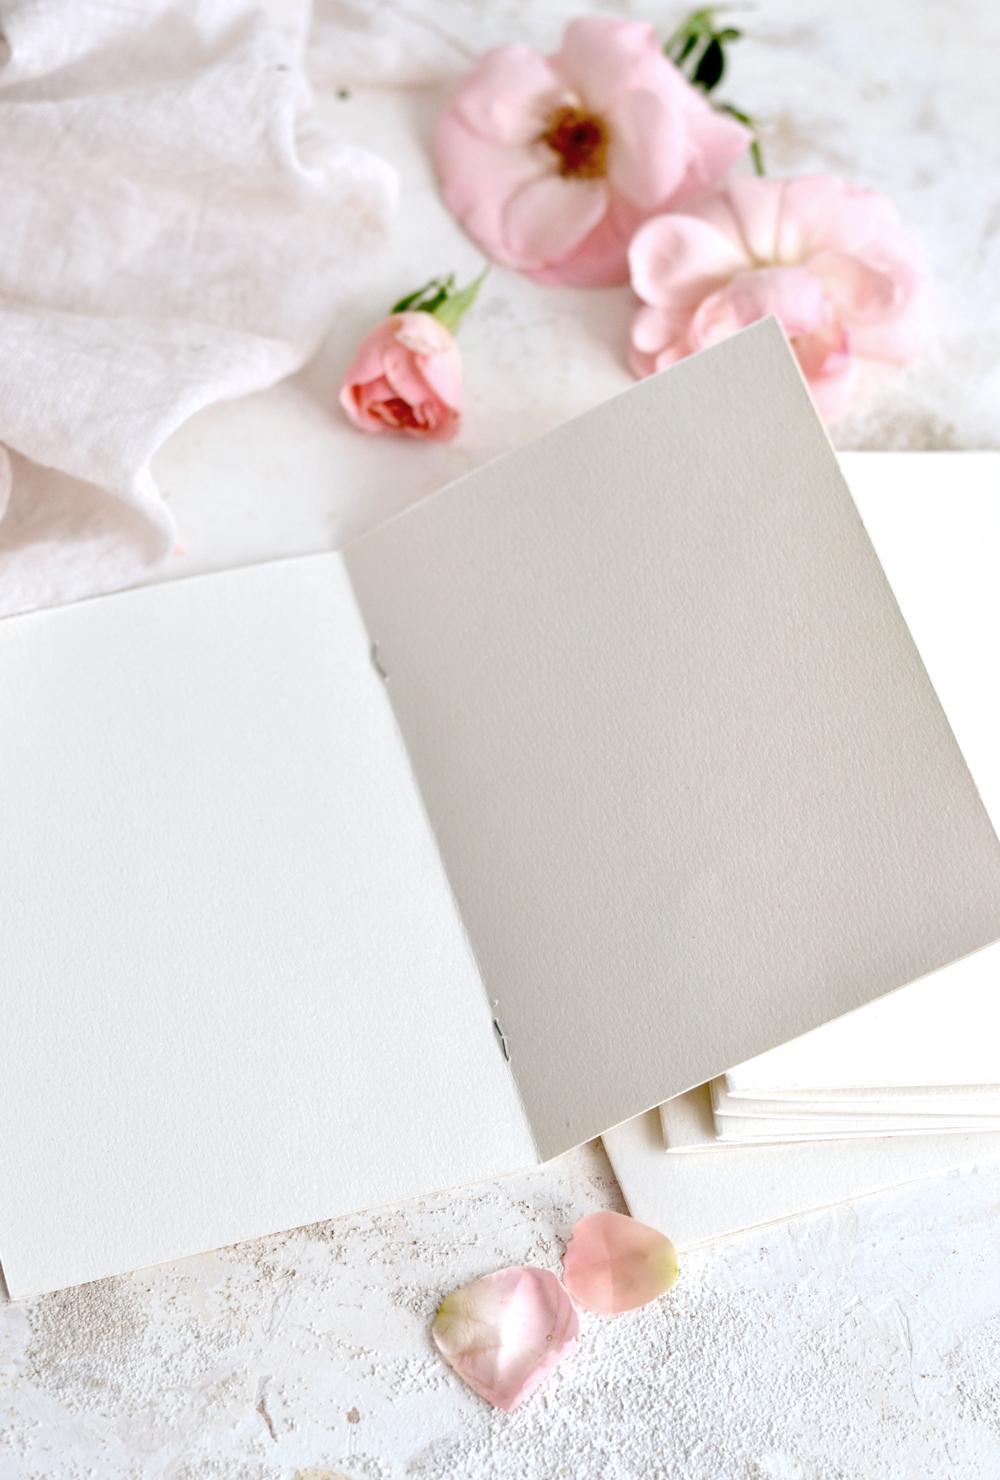 5 Minute DIY Notebooks